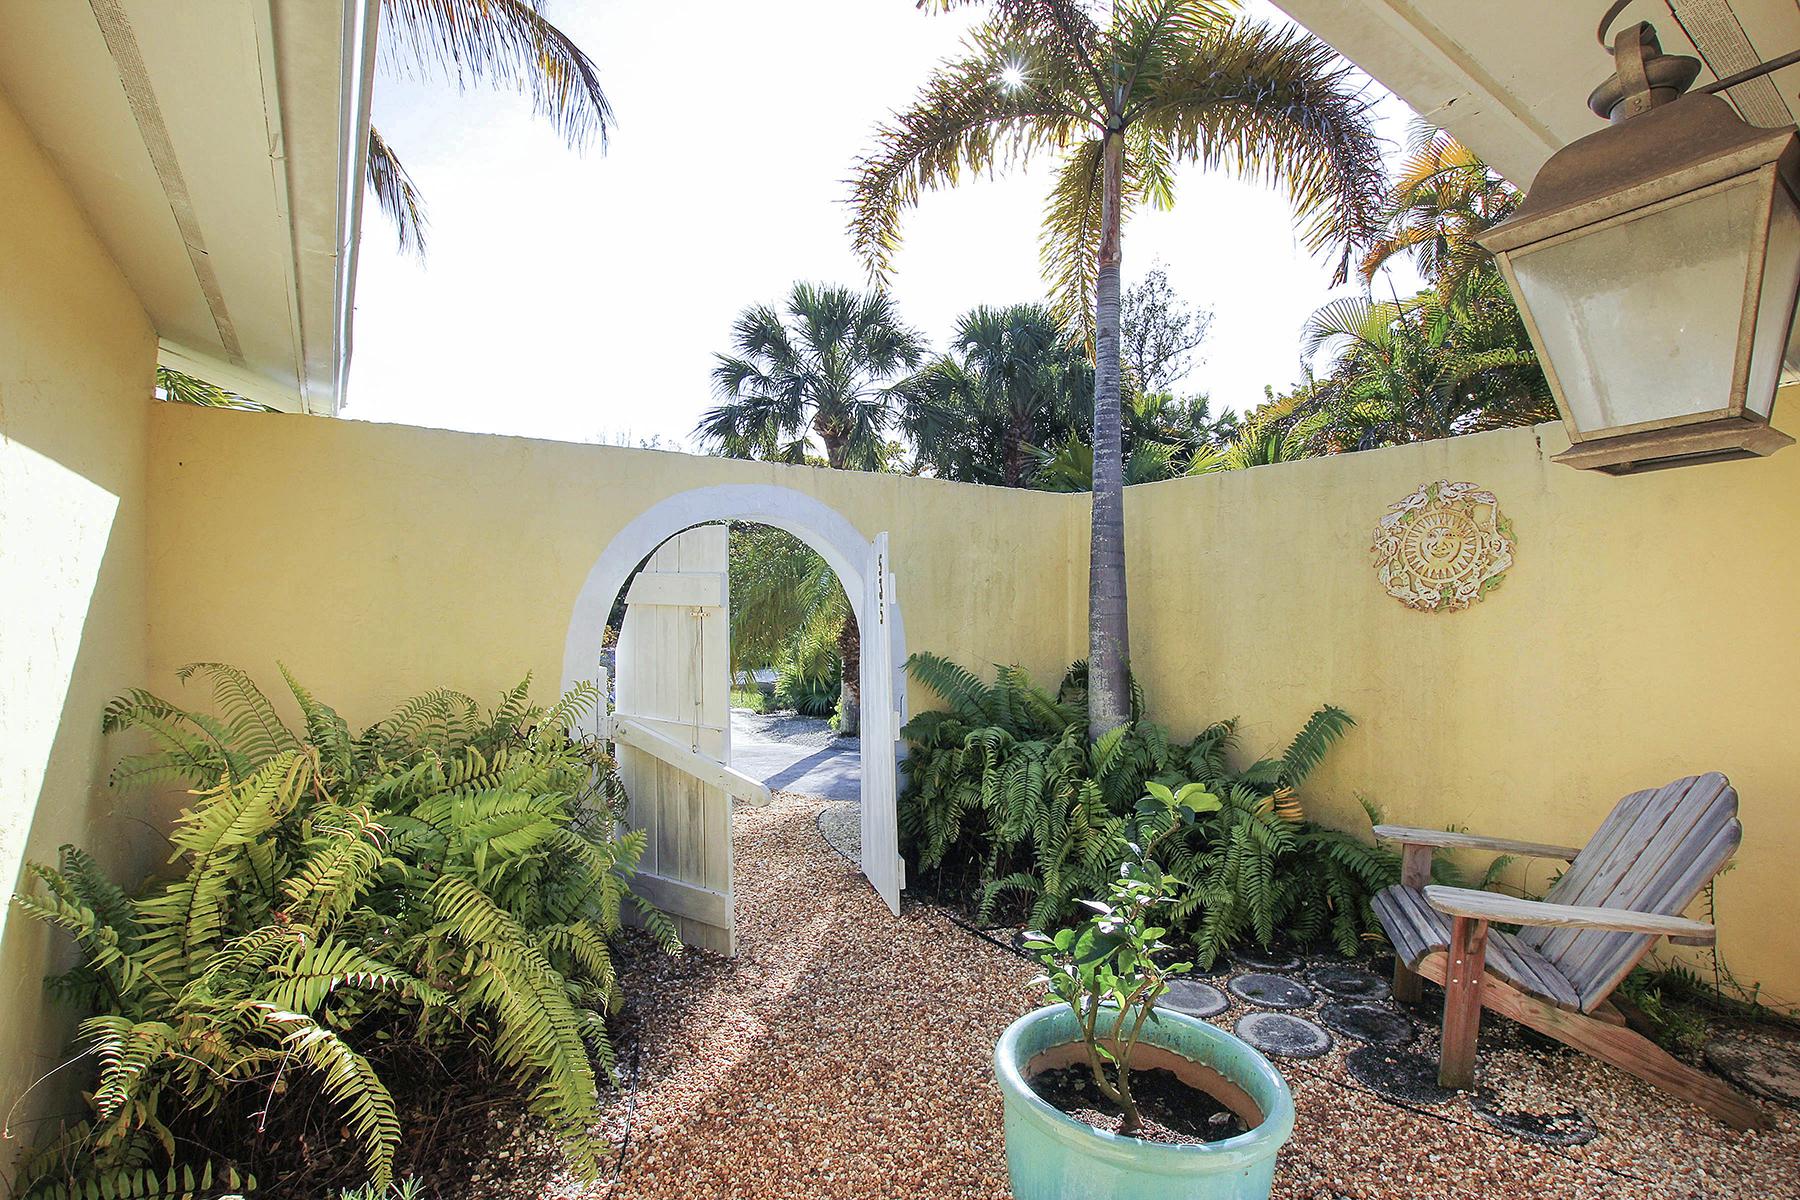 Single Family Home for Sale at SANIBEL 535 Birdsong Pl, Sanibel, Florida 33957 United States